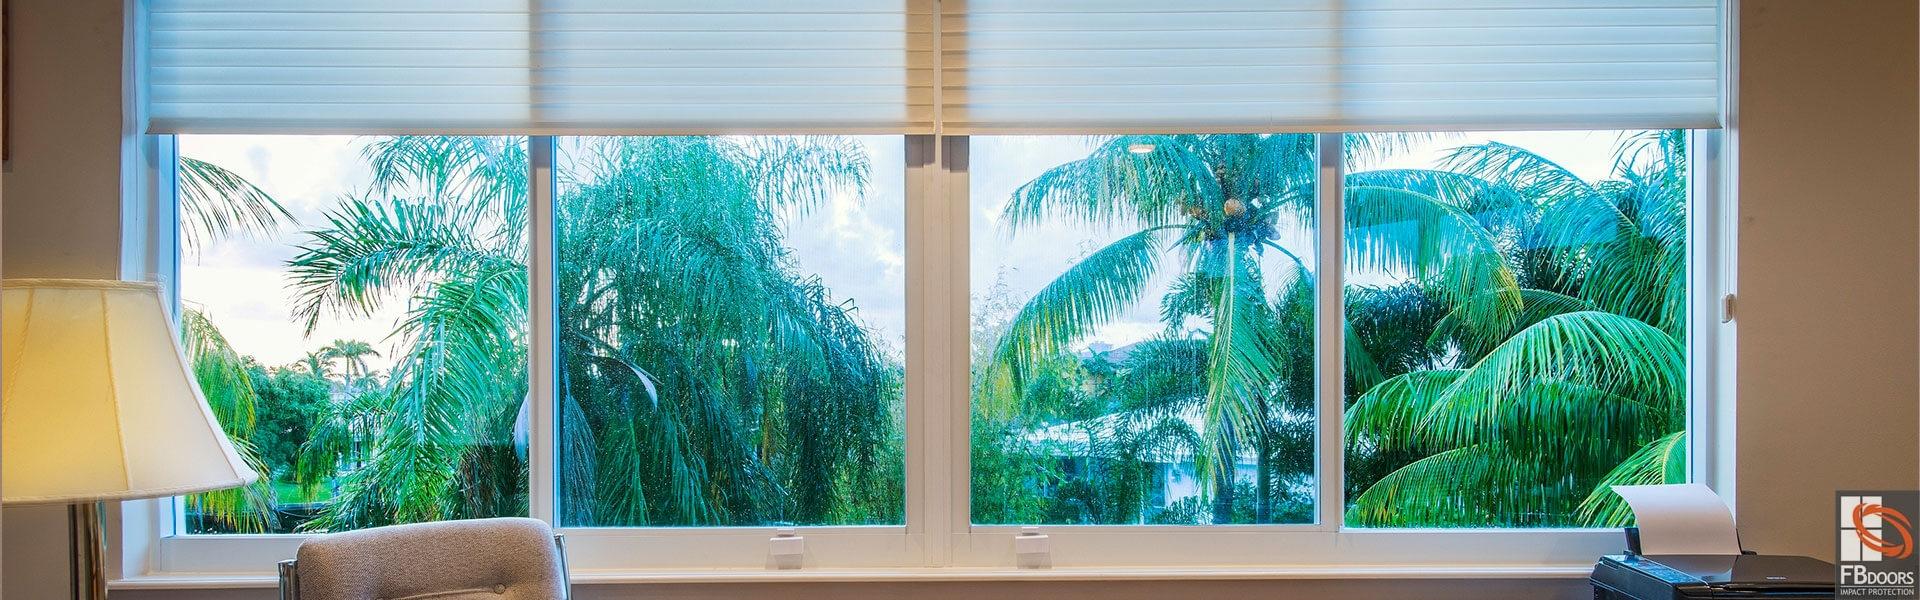 Miami Dade Impact Windows and Doors